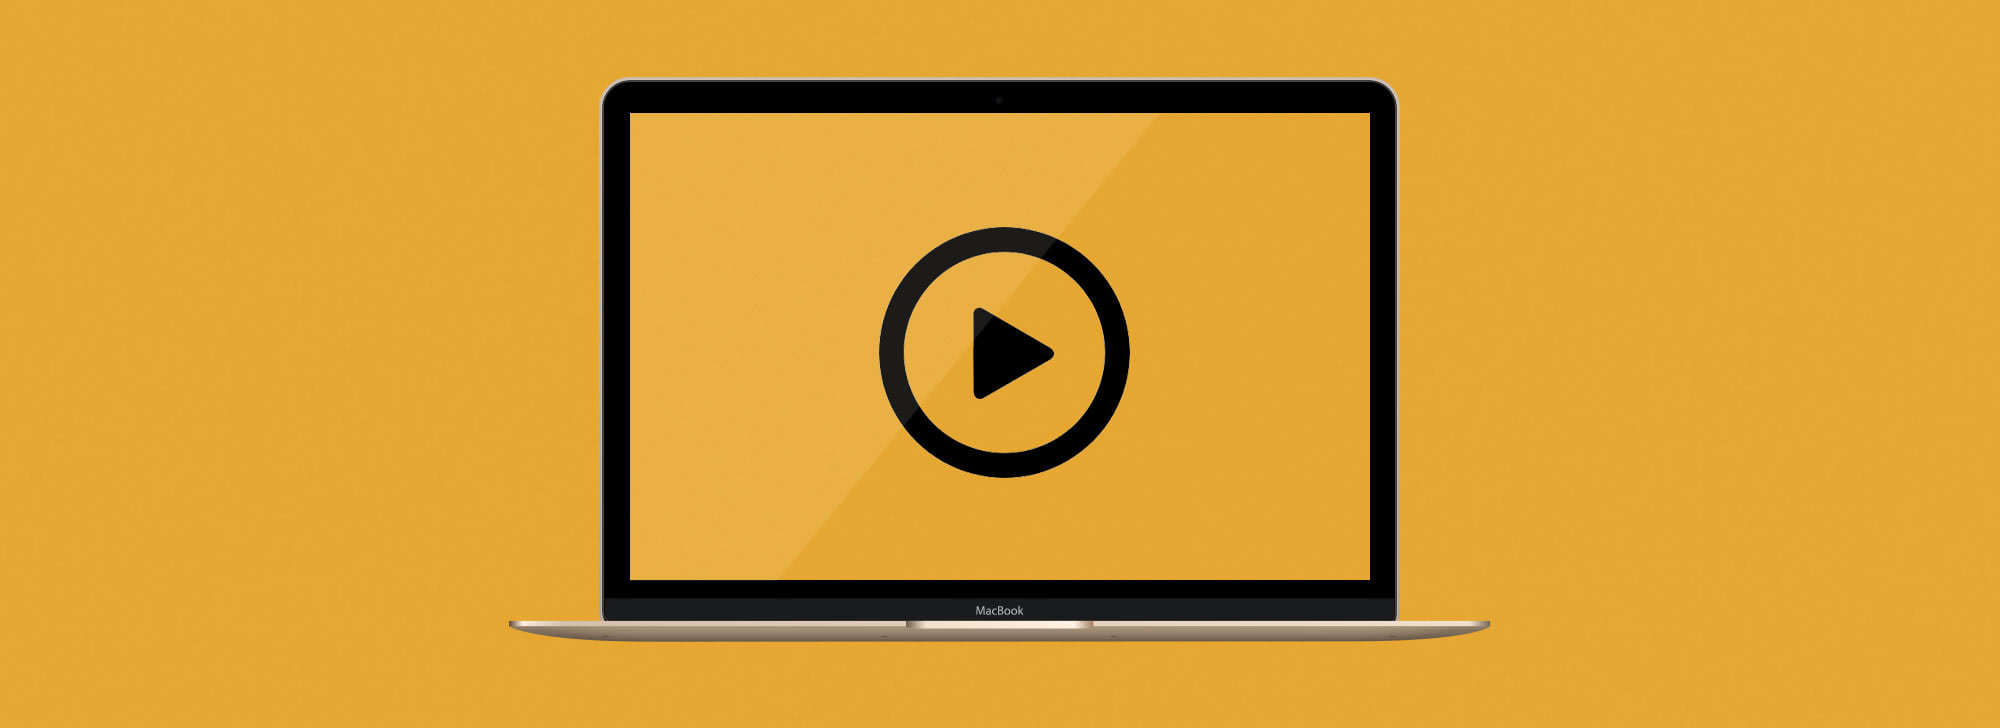 Fierce Conversations Webinar 5 Conversations to Drive Performance